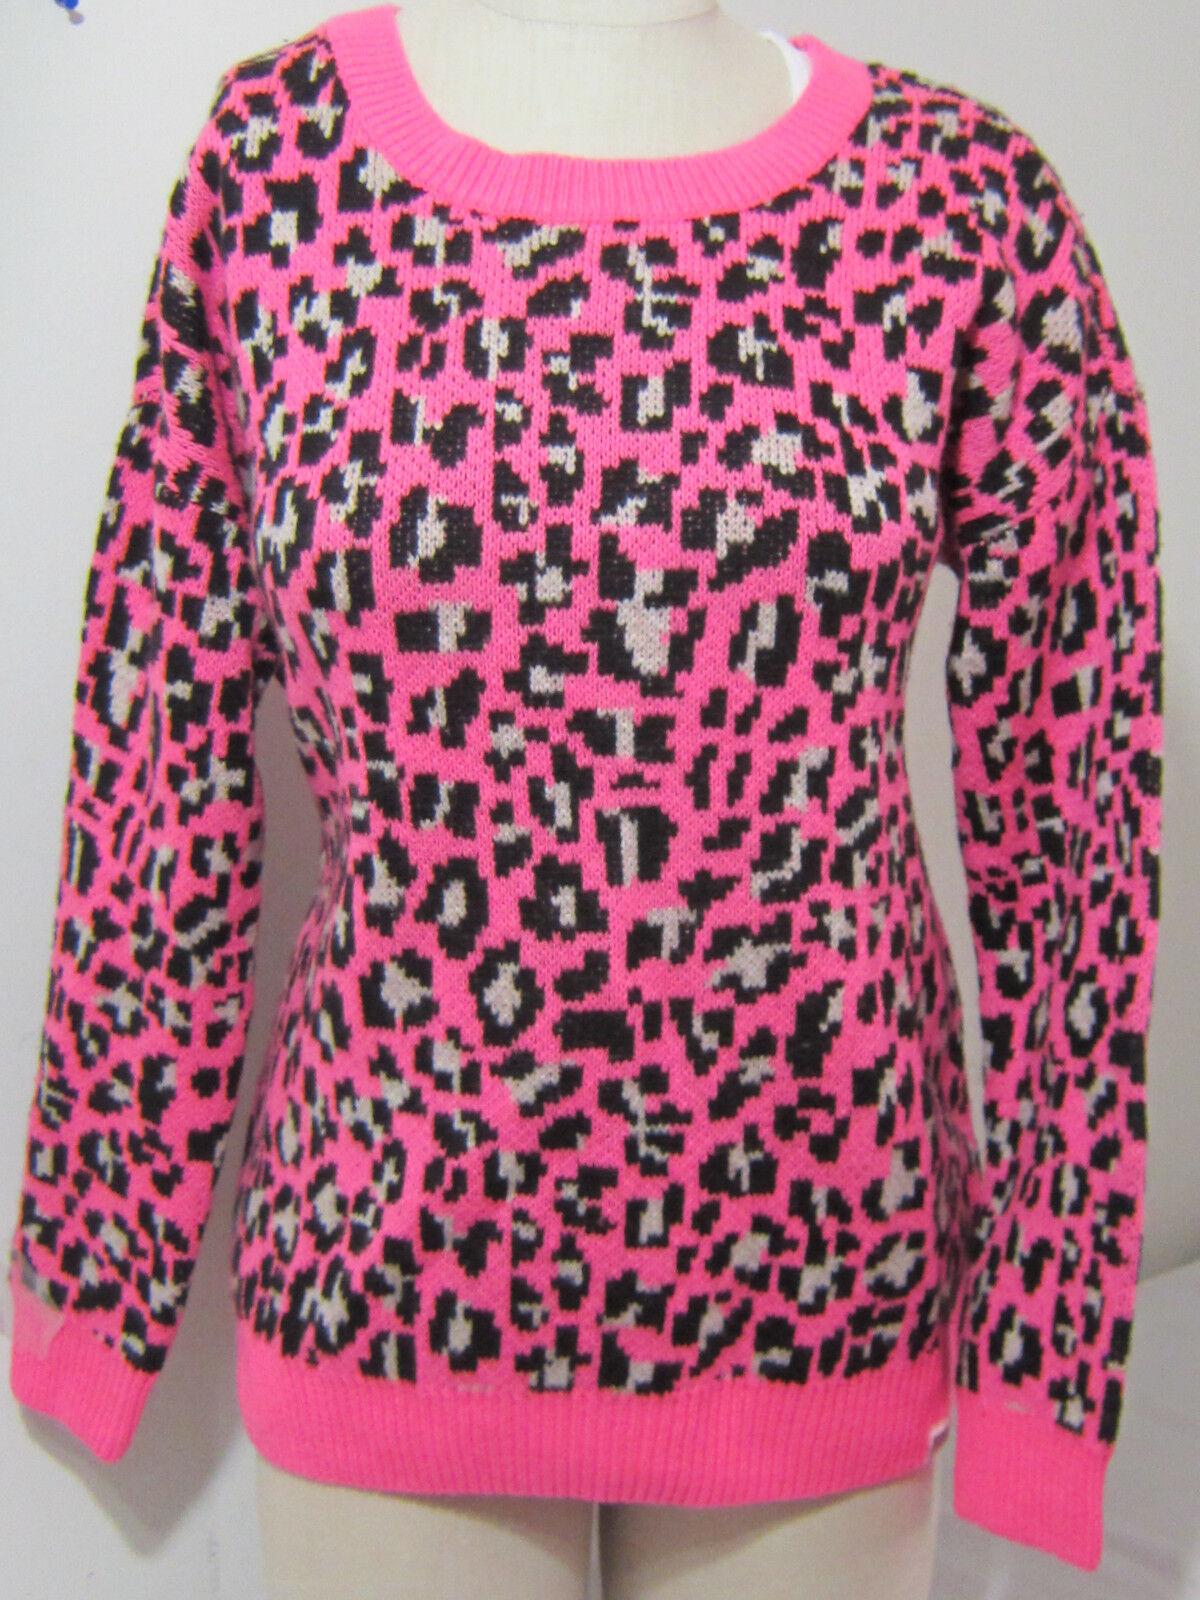 @ Victoria Secret Pink LEOPARD BOYFRIEND SWEATSHIRT CREW SWEATER XS Tunic Length